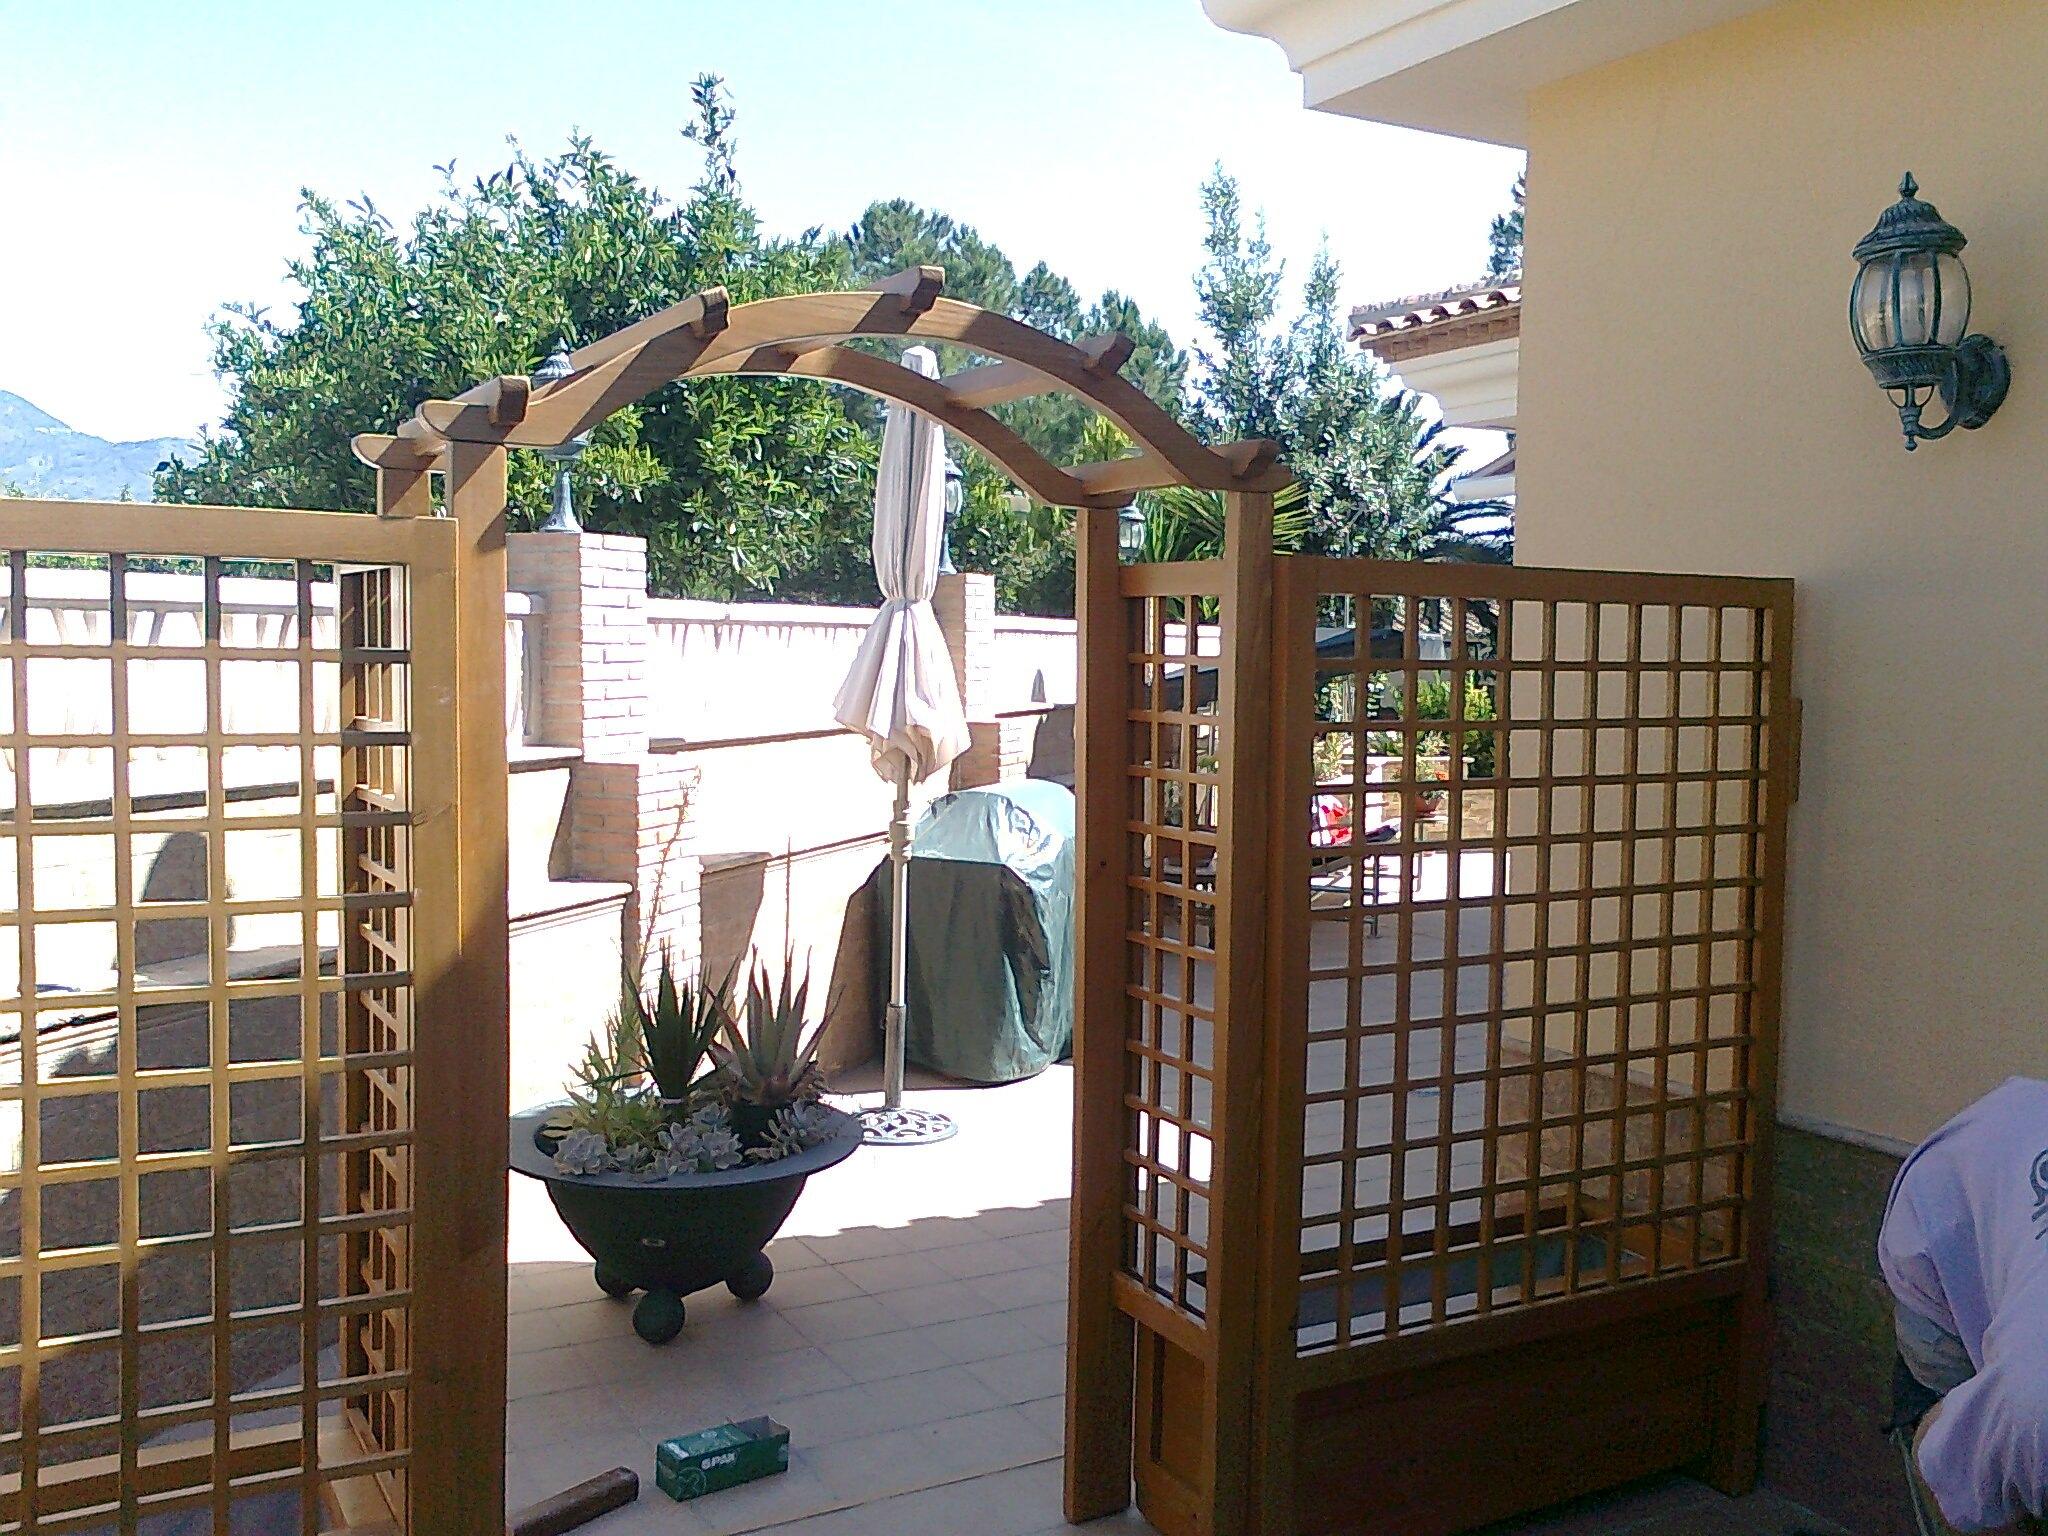 Celos a para jardin celosia para separar dos ambientes for Celosias para jardin